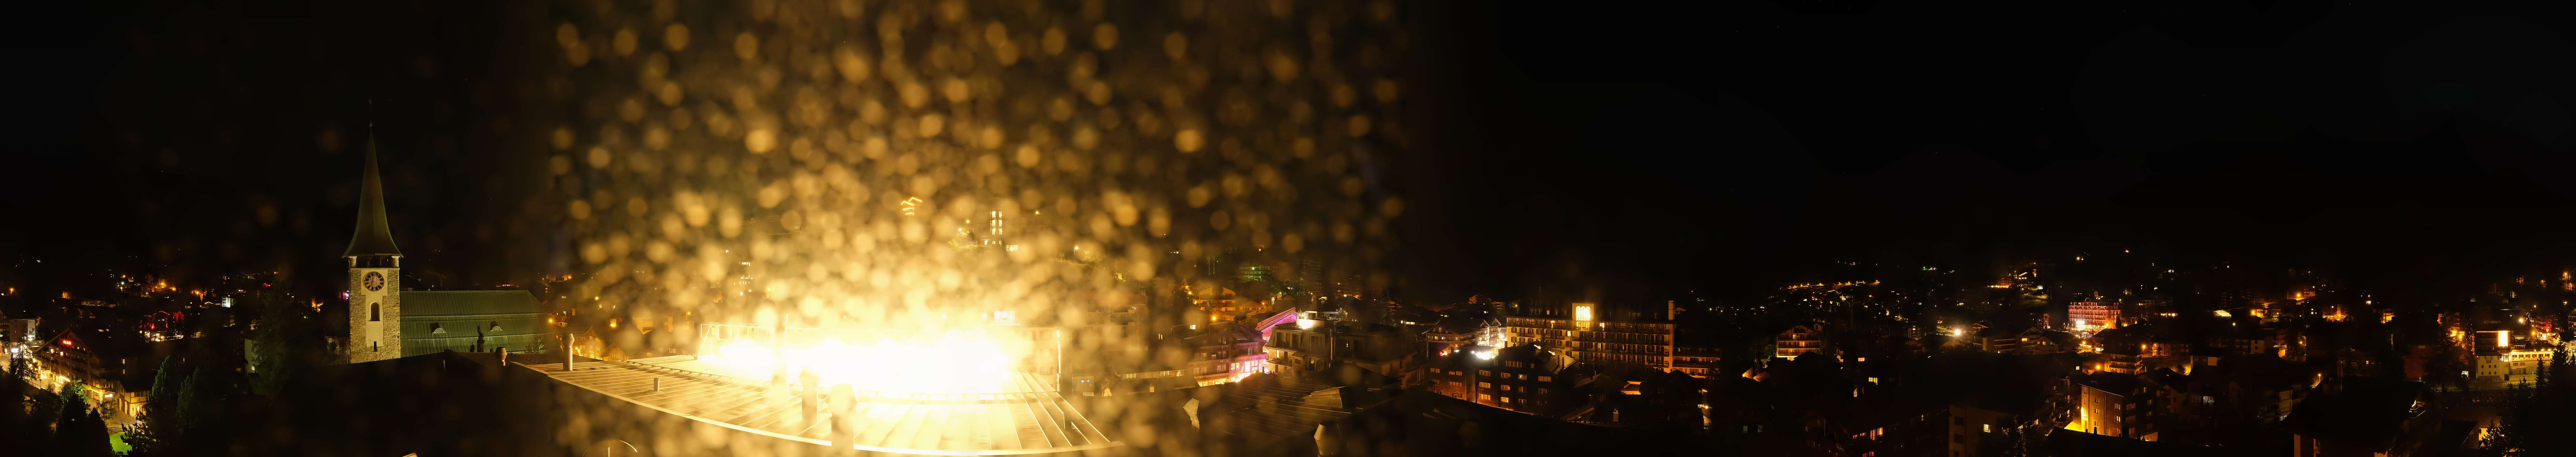 Livecam Zermatt Zermatterhof